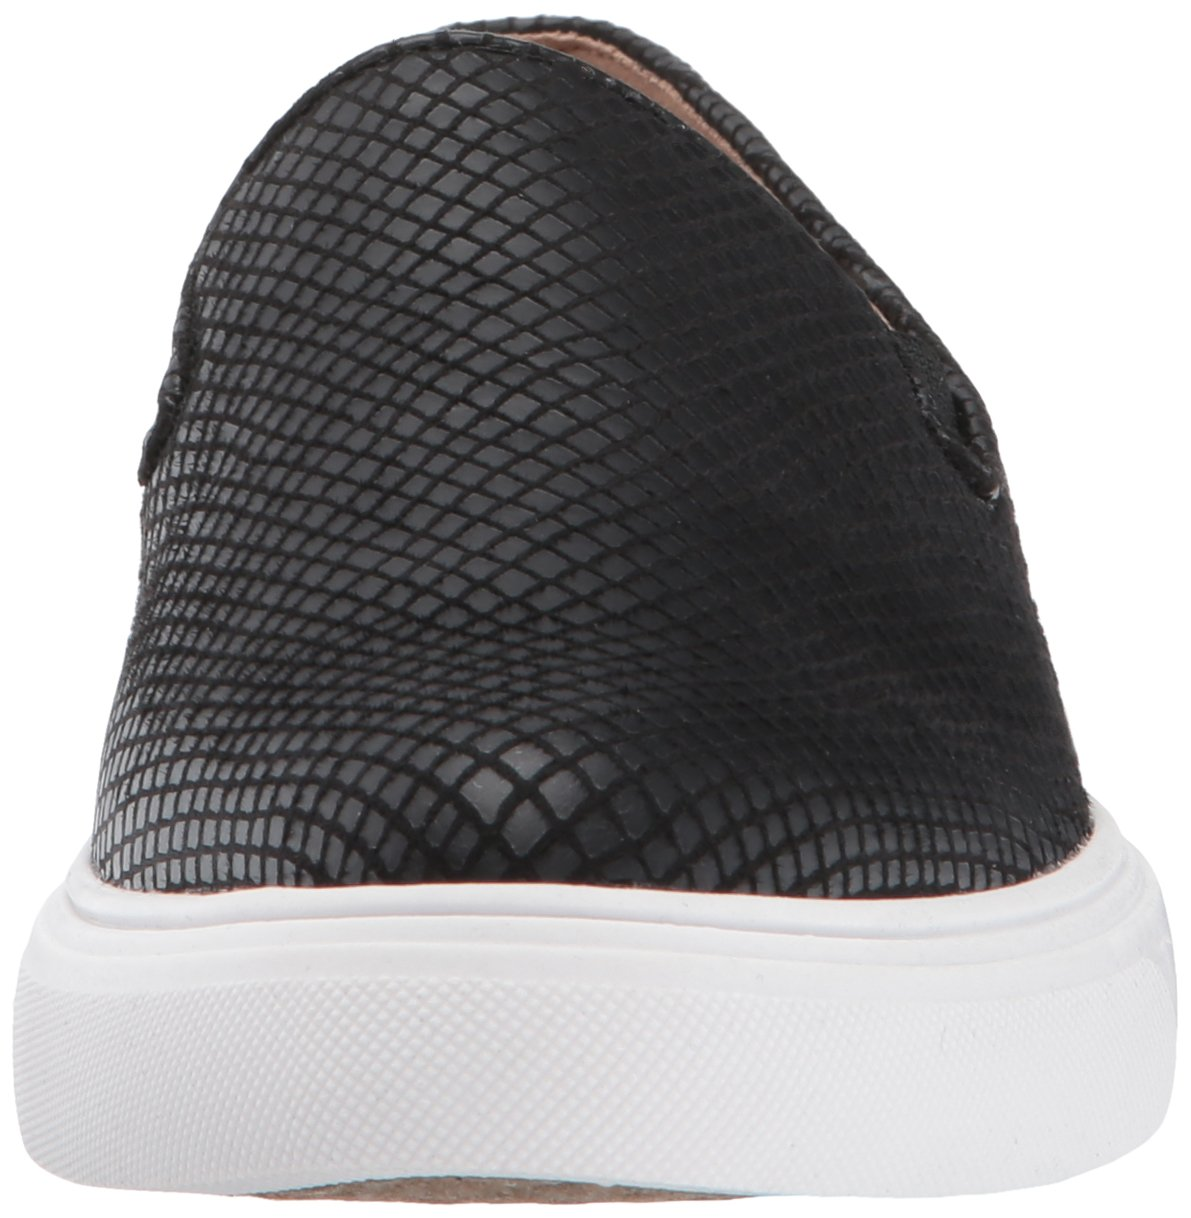 Franco Sarto Women's Mony Sneaker B072BGN77B 10.5 B(M) US|Black